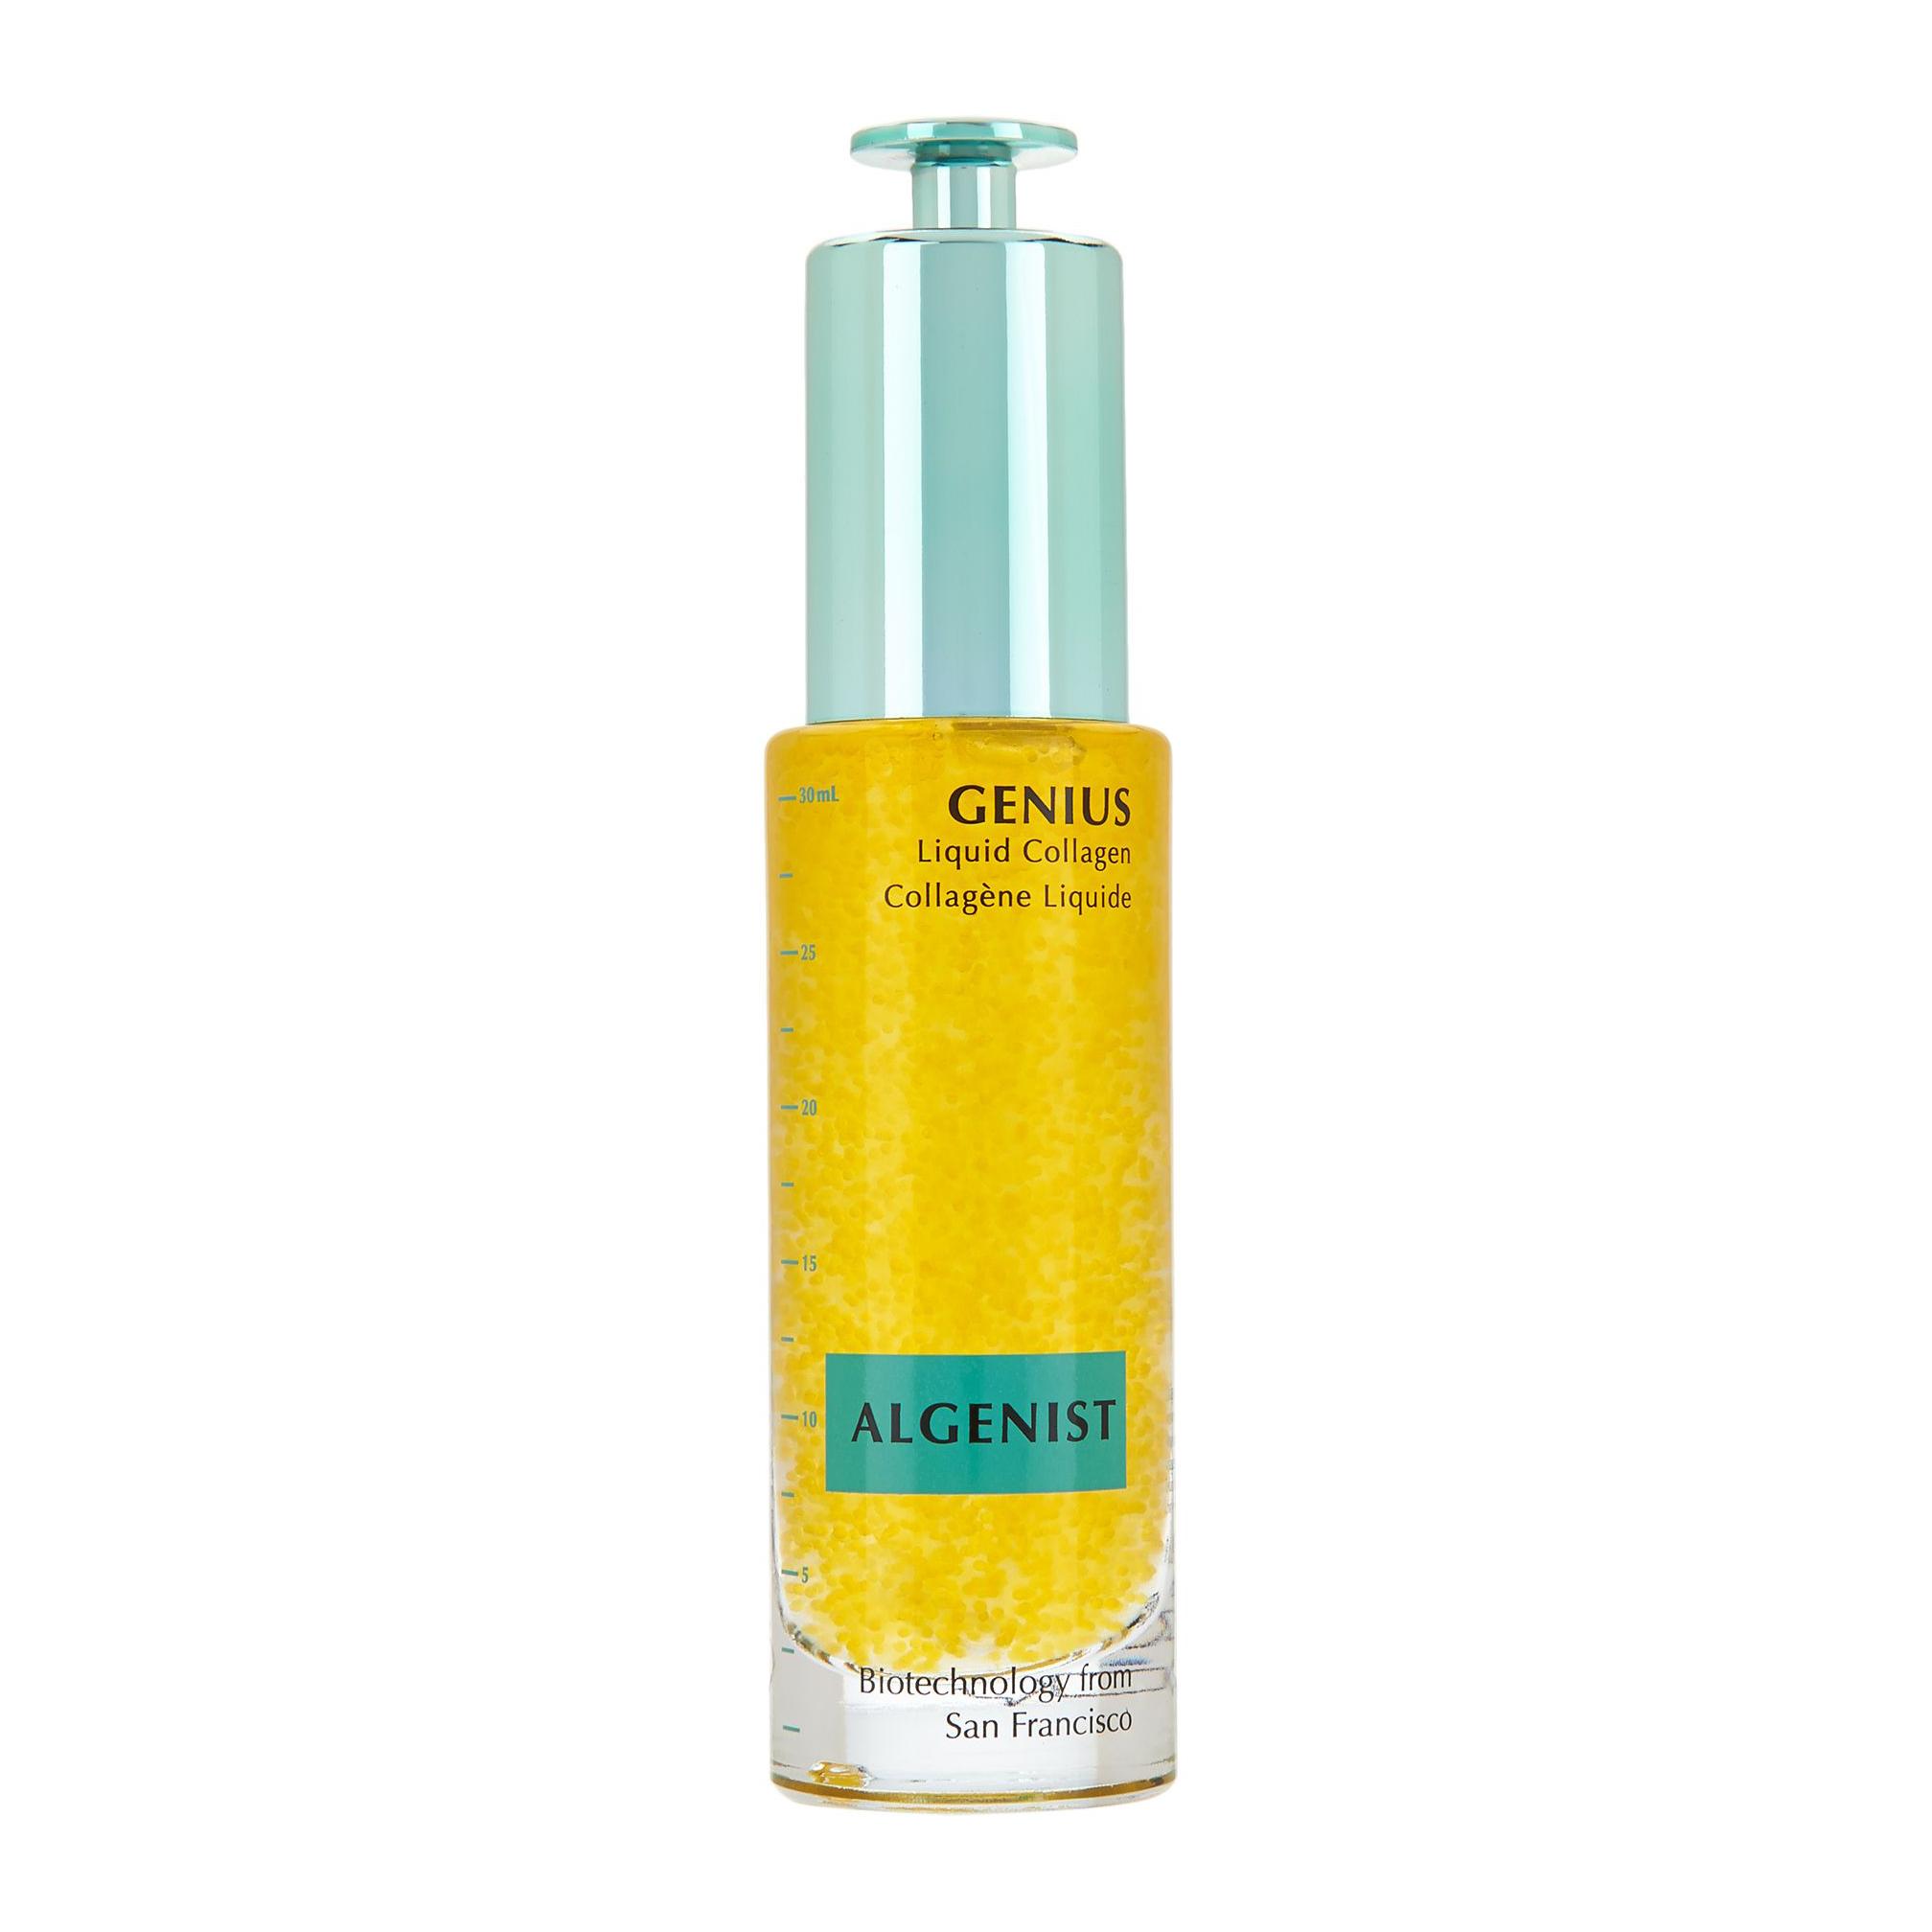 Algenist  liquid collagen